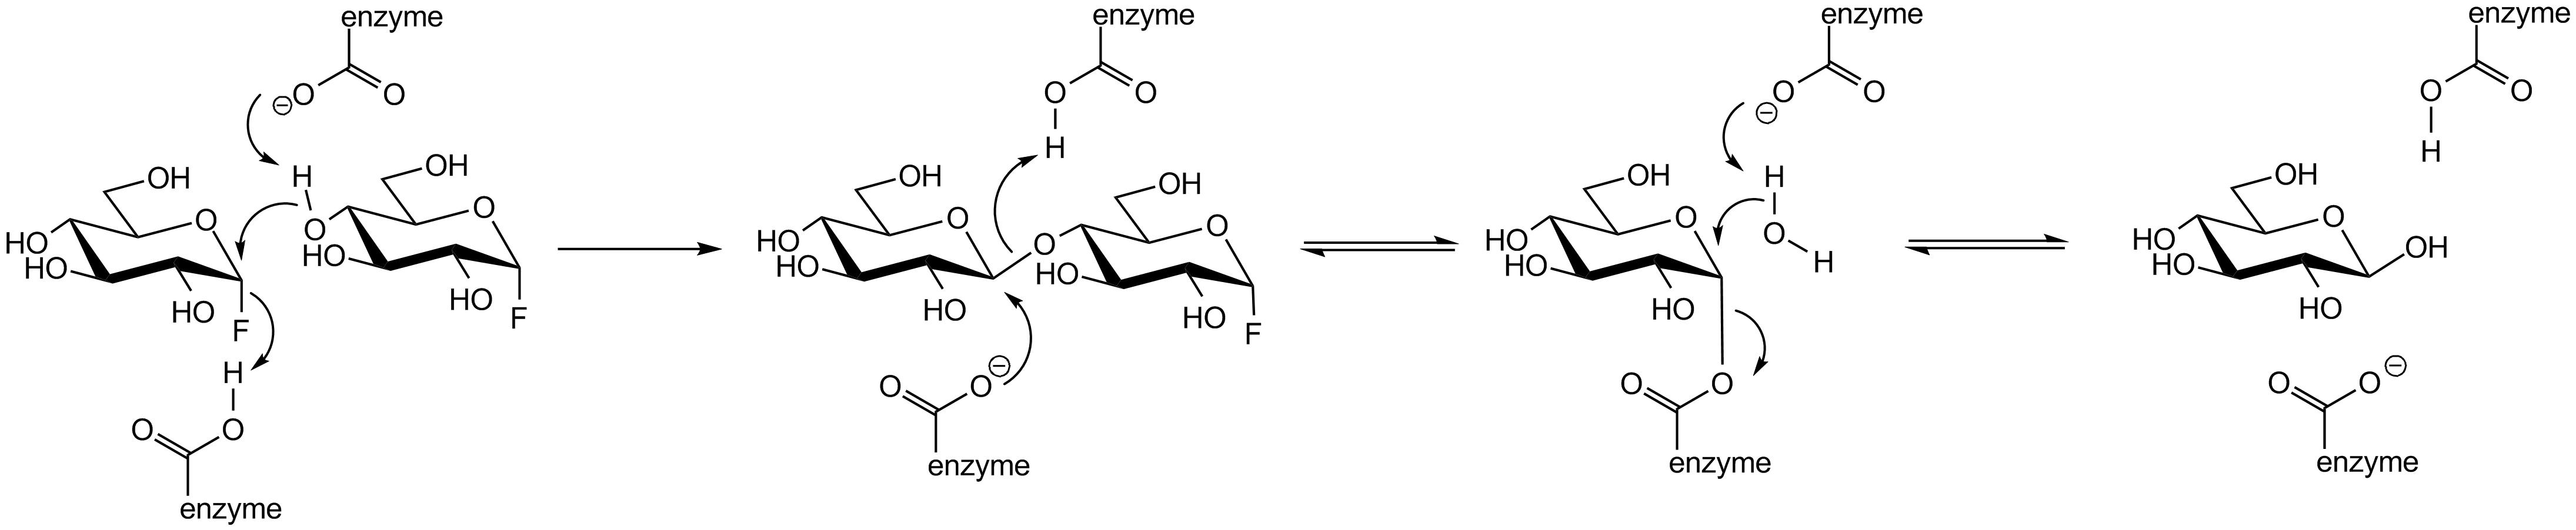 File:Glycosidase transglycosylation mechanism.png ...